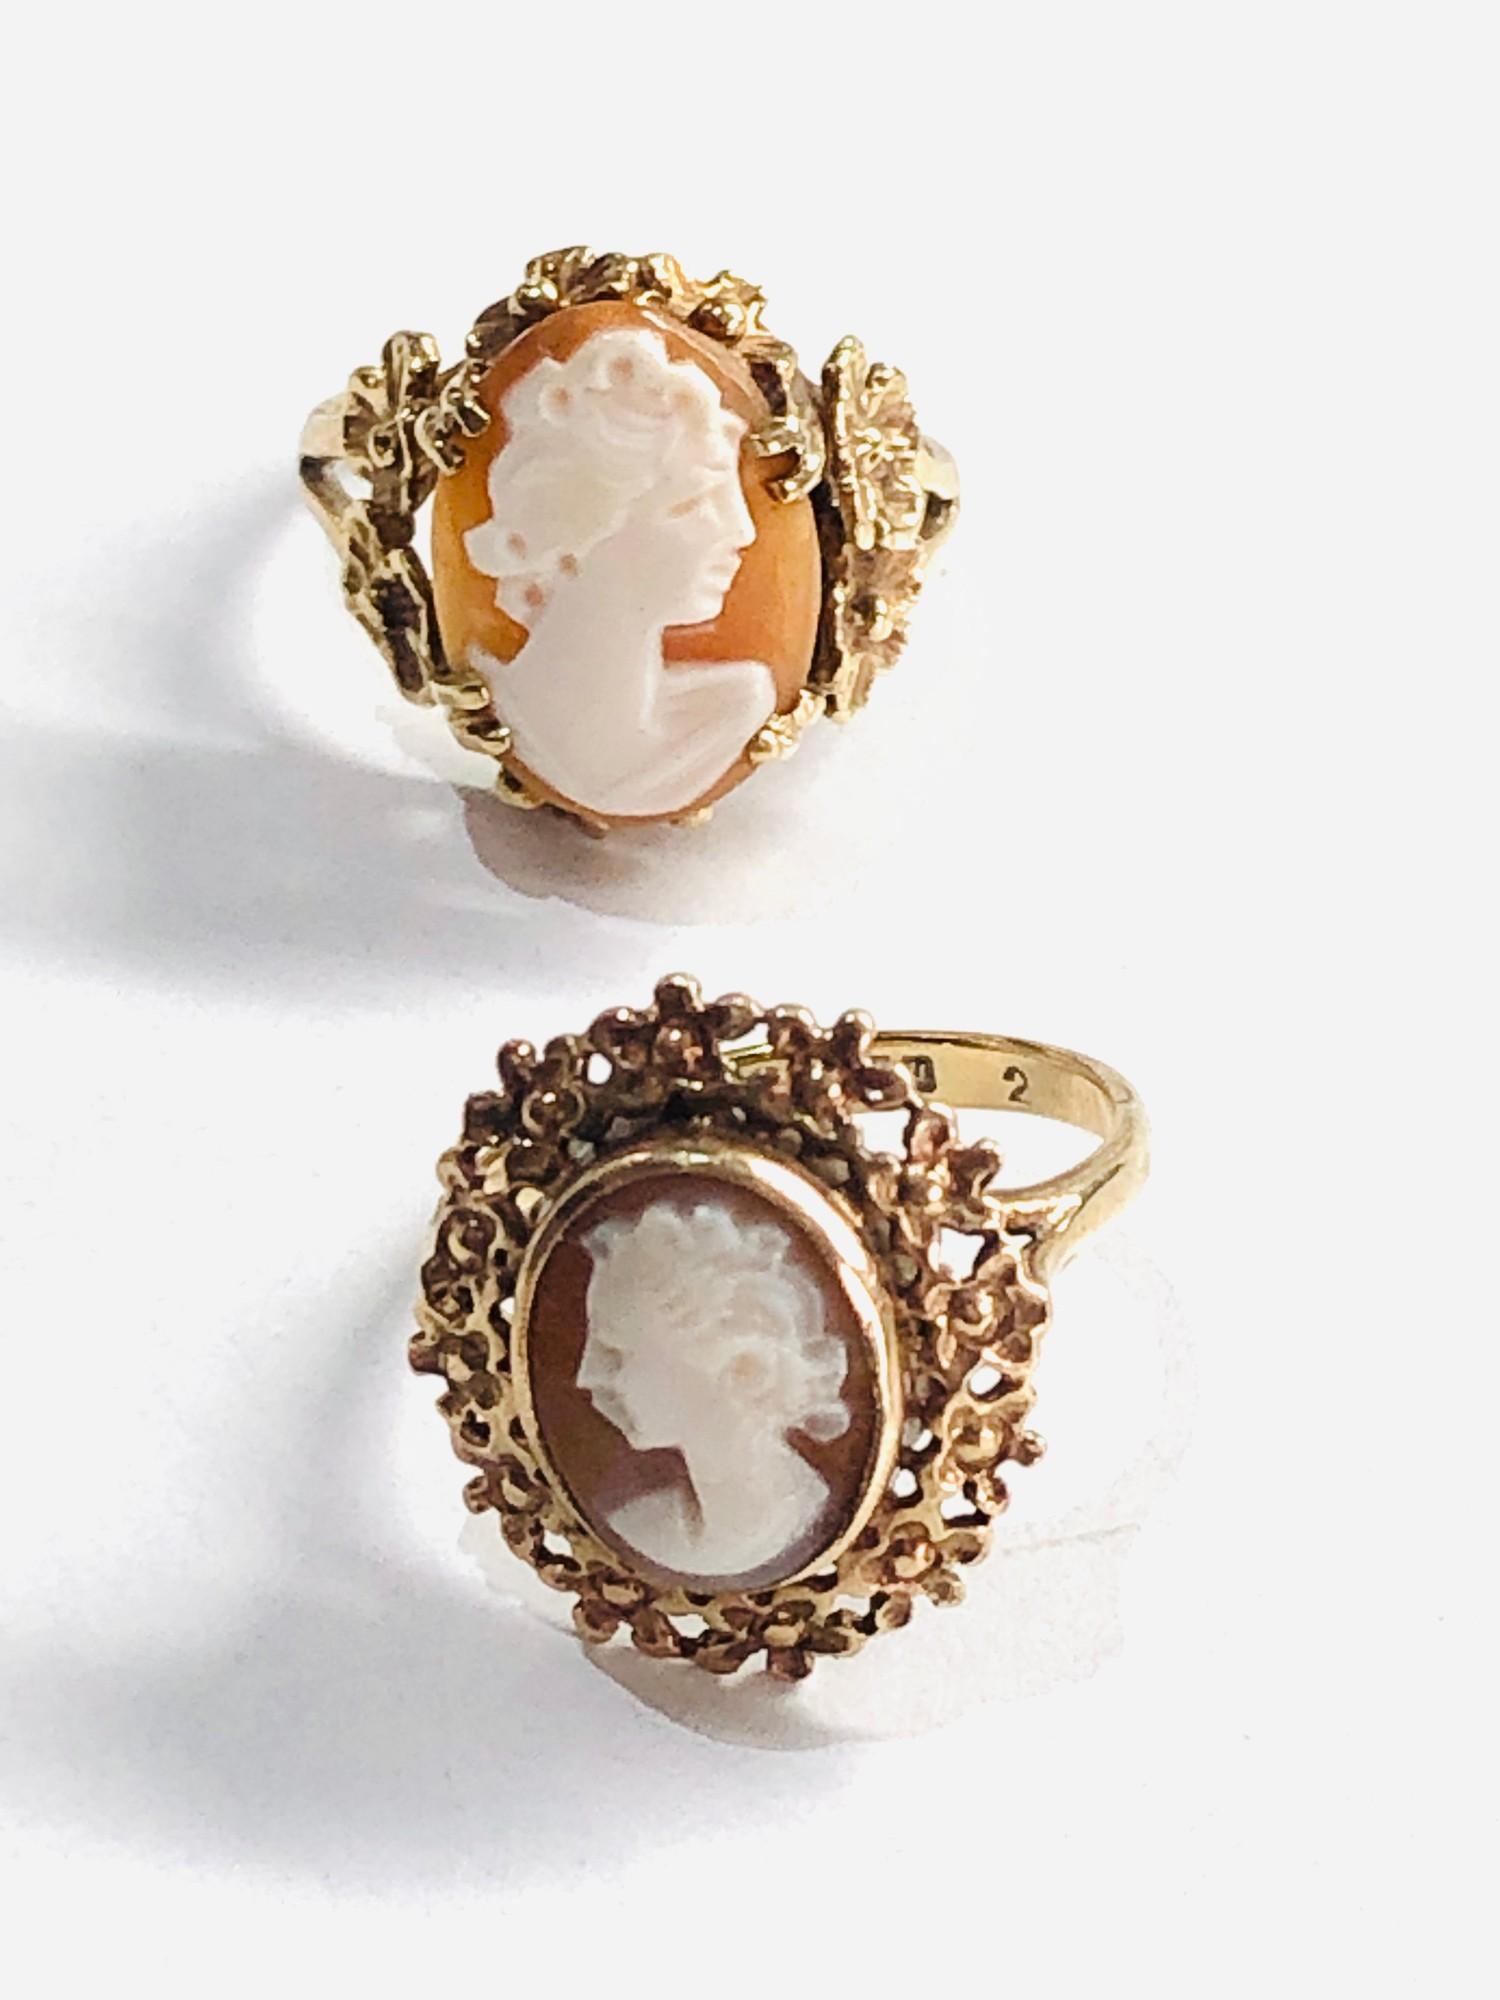 2 x 9ct gold vintage cameo floral framed rings 6g